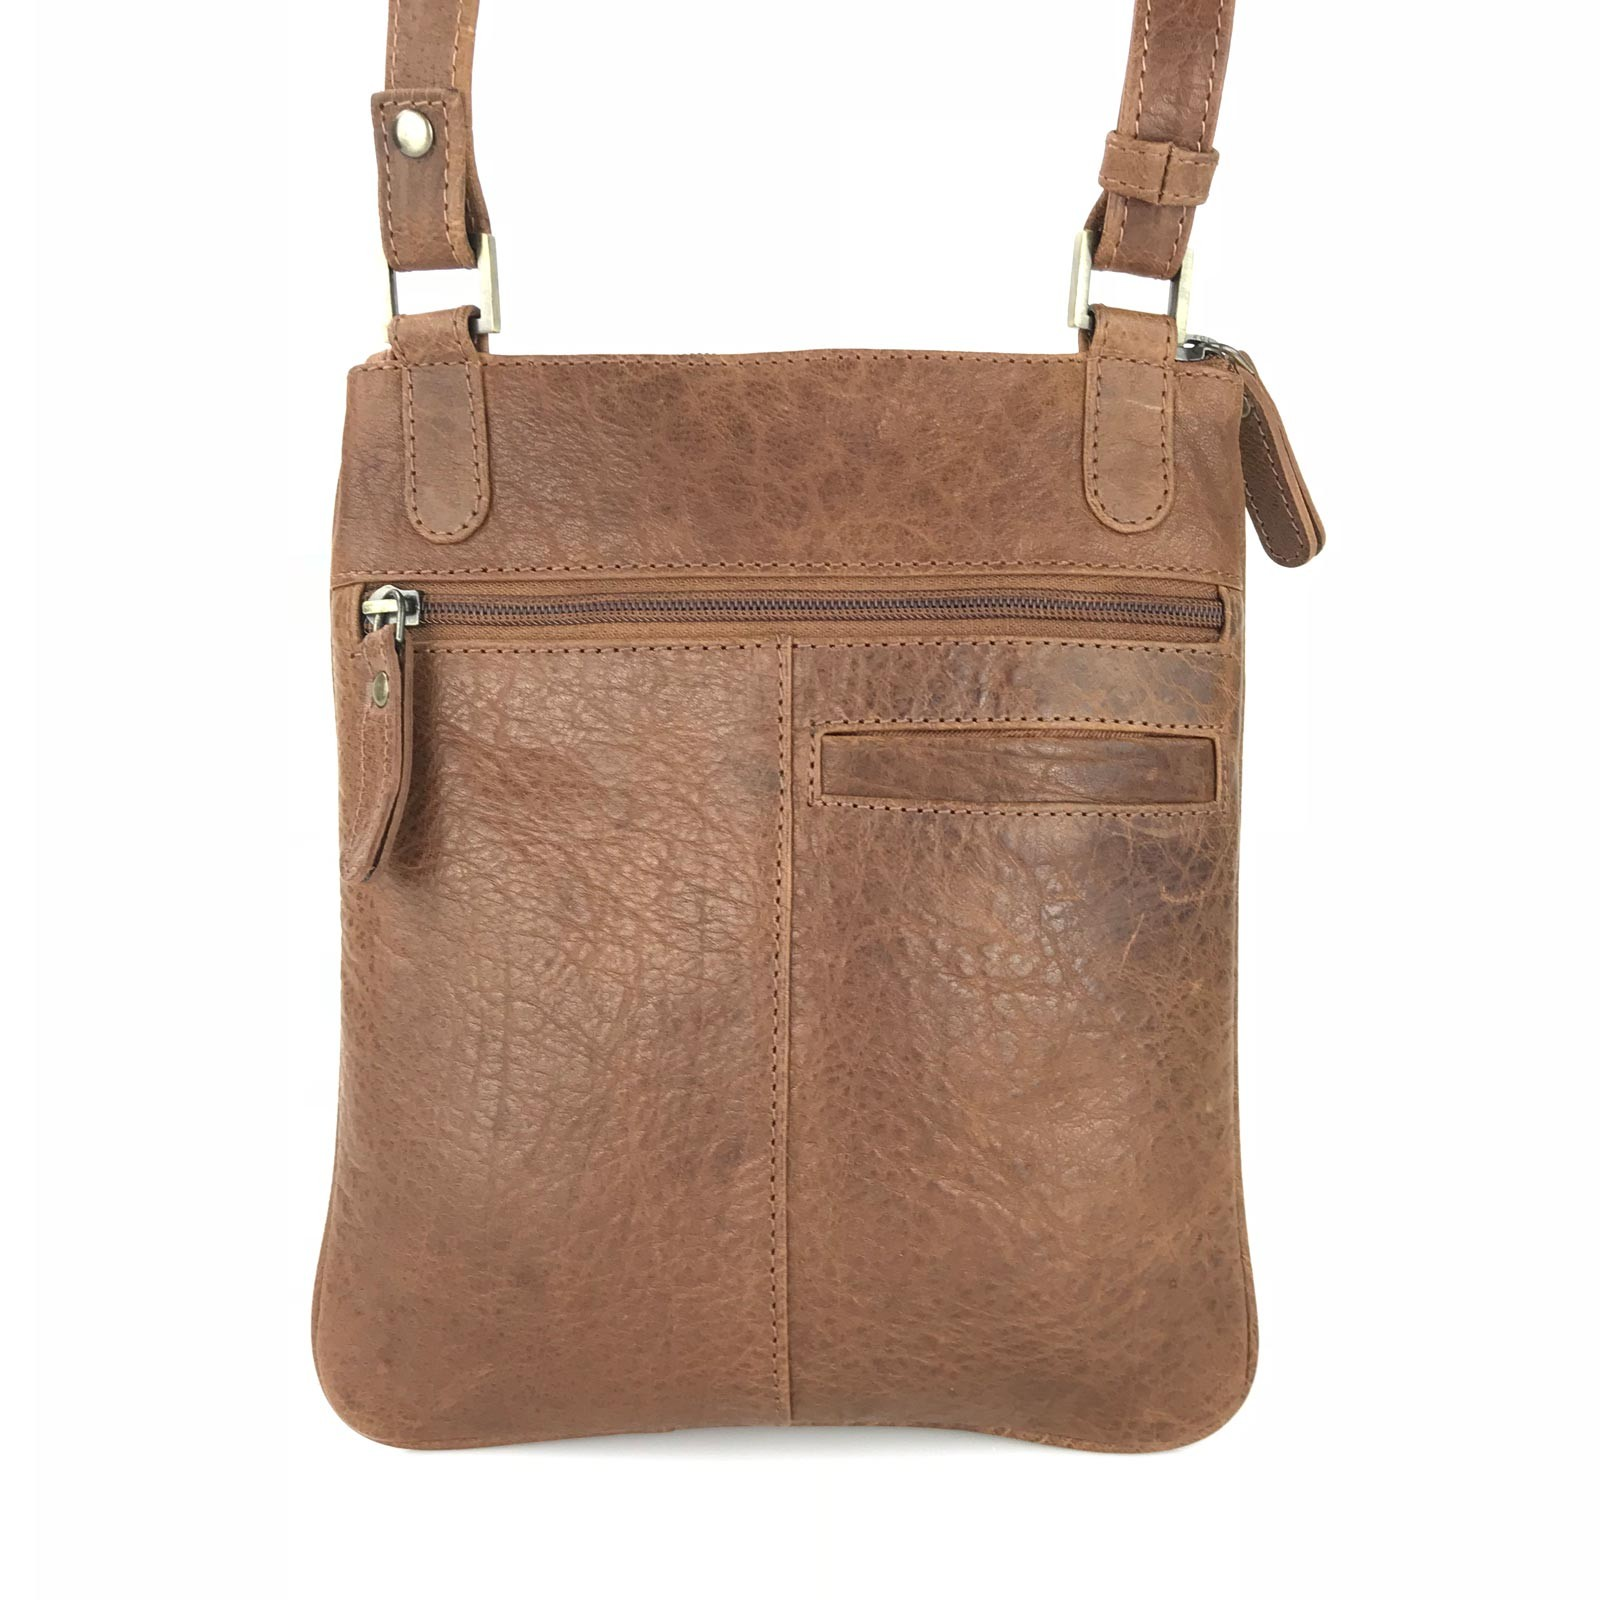 2e7b0eb69363 BF-6485 Laurentino Ladies Leather Cross Body Bag-Tan